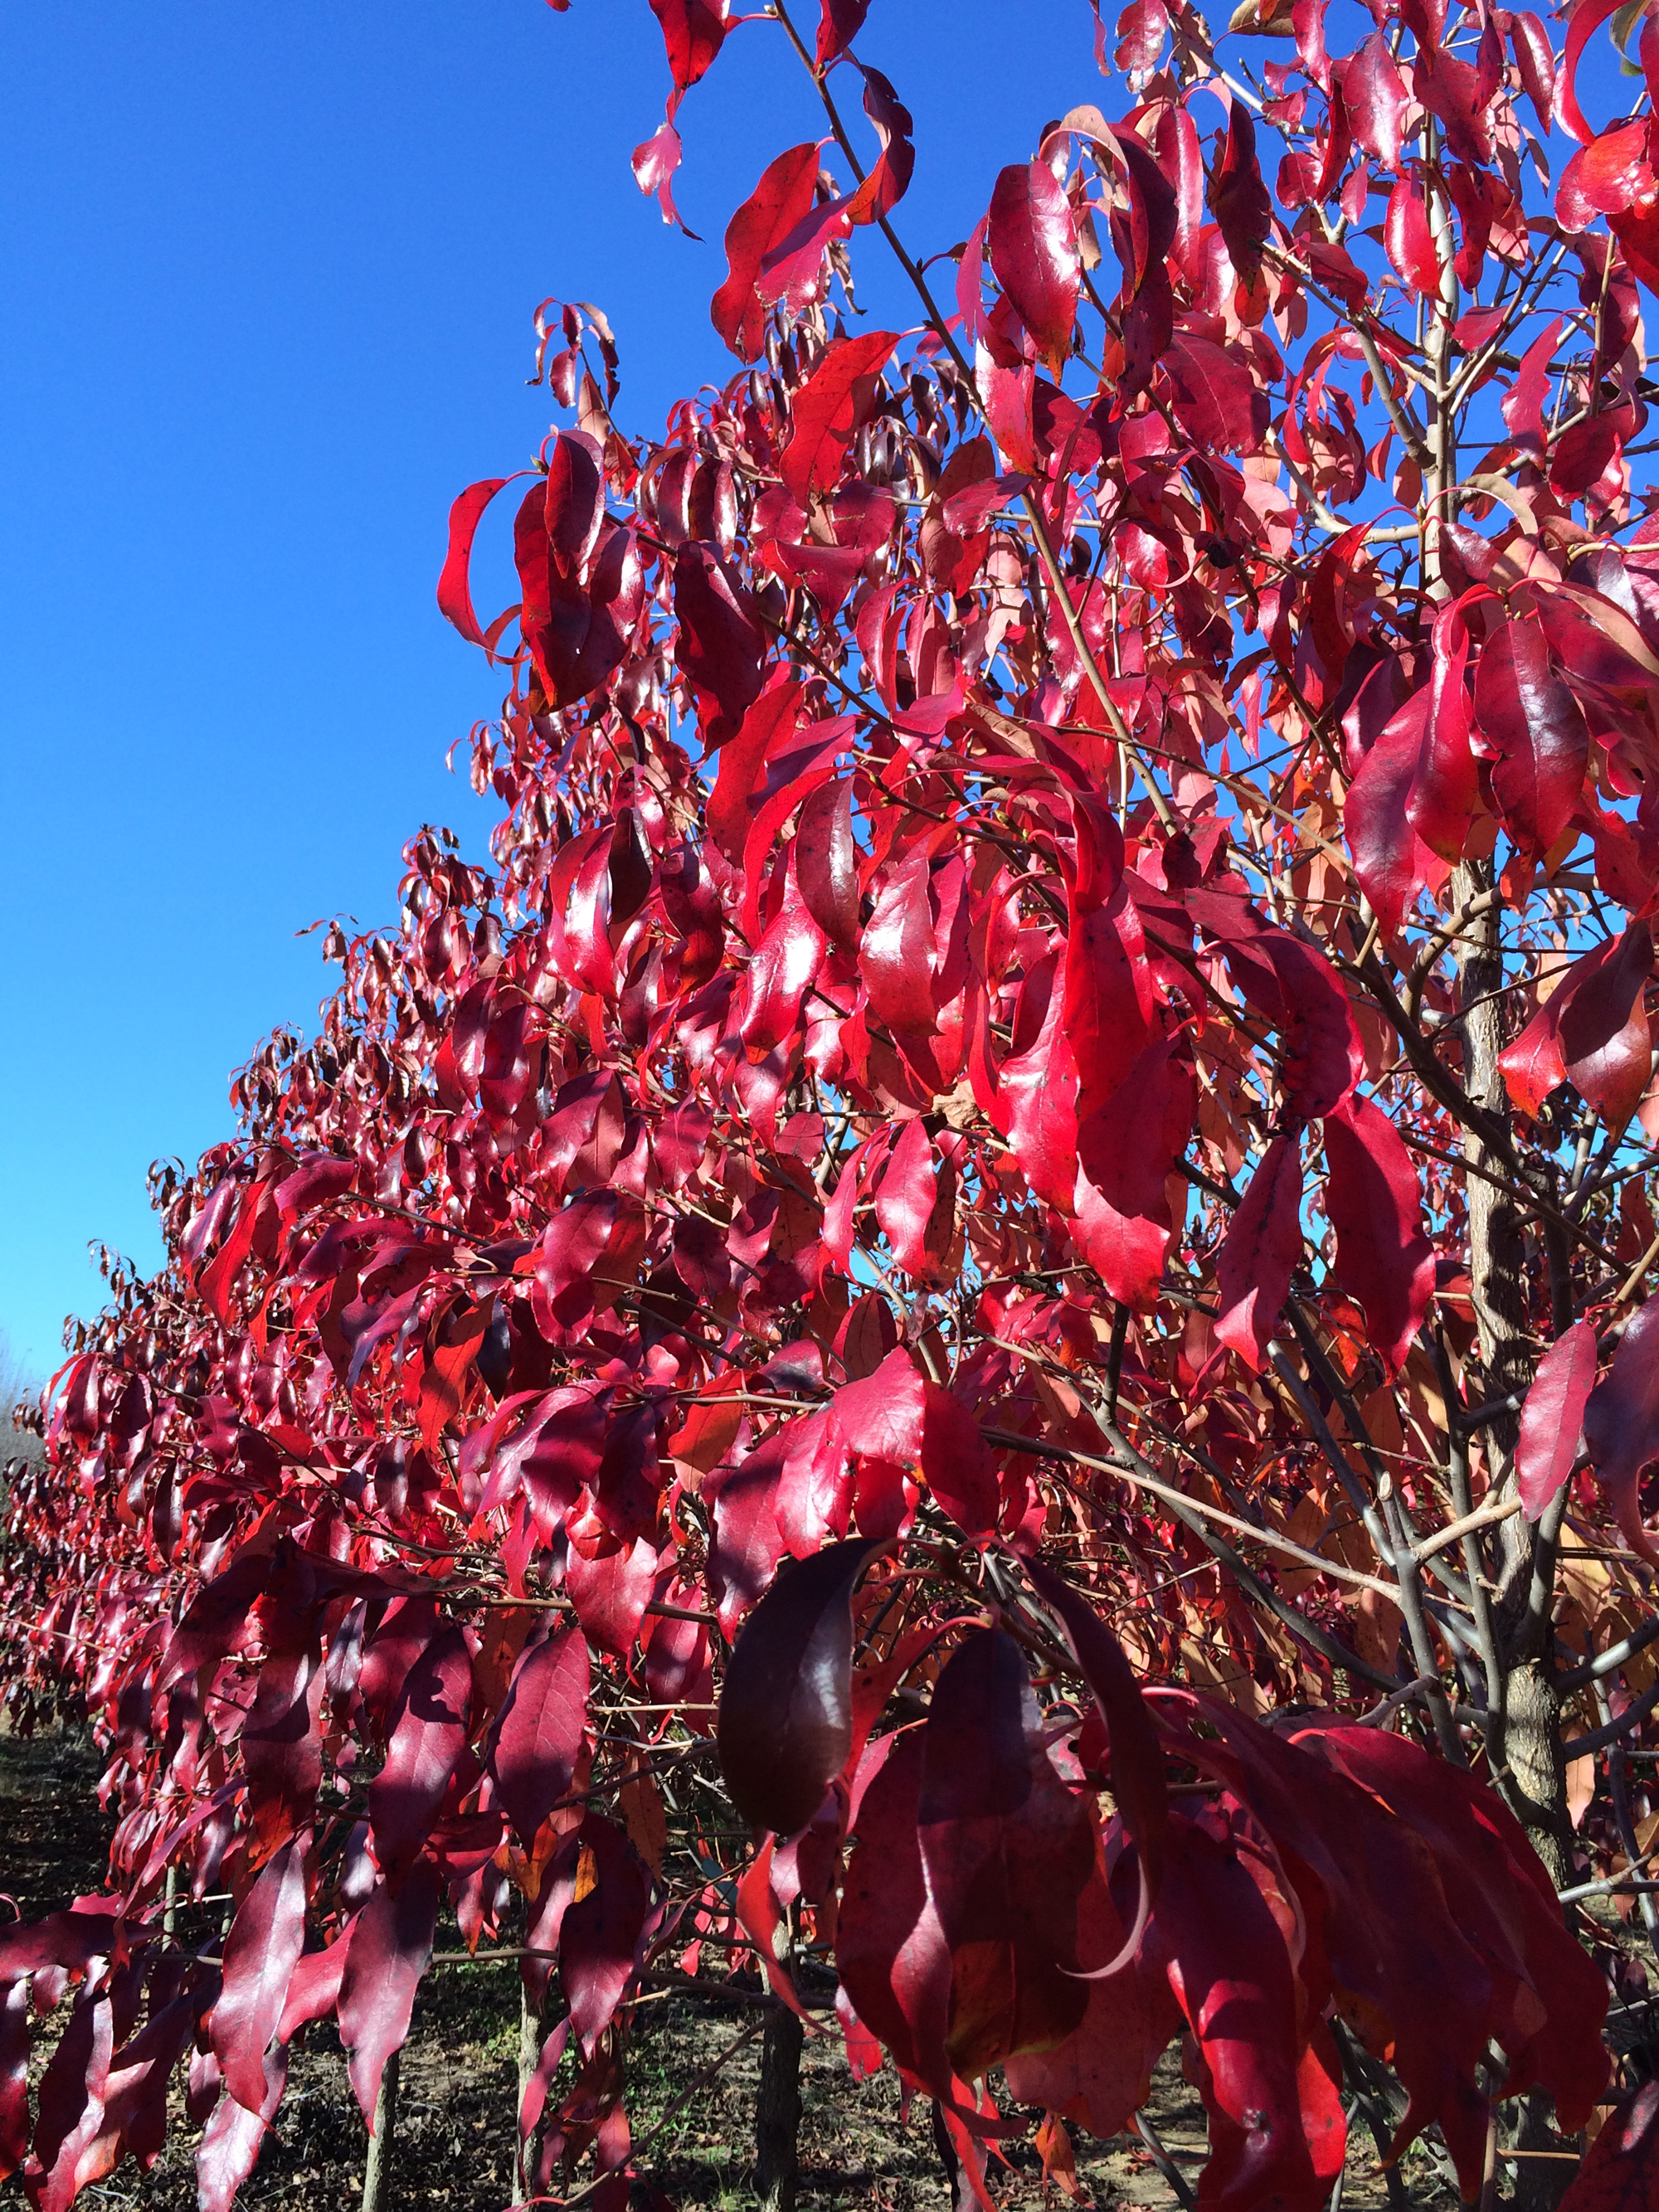 White-Chapel-Tupelo-Nyssa-sylvatica-fall-color-2.jpg